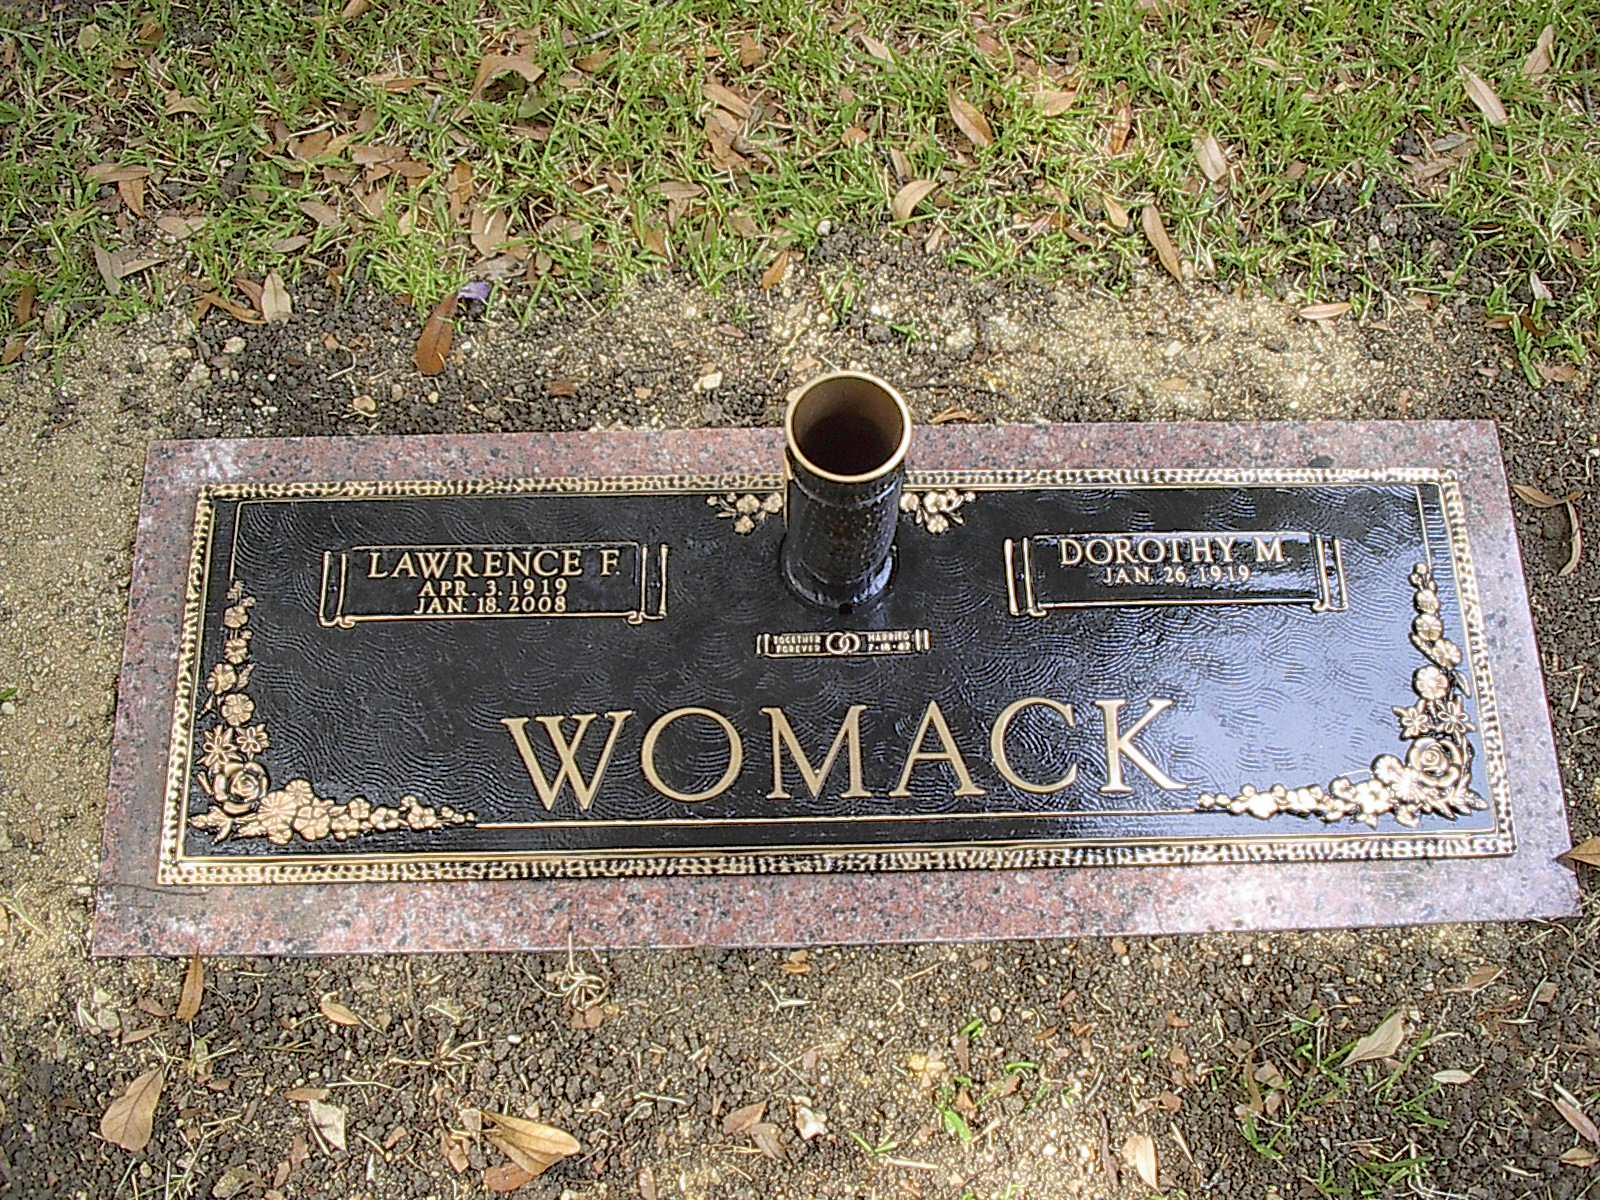 WOMACK (1).JPG